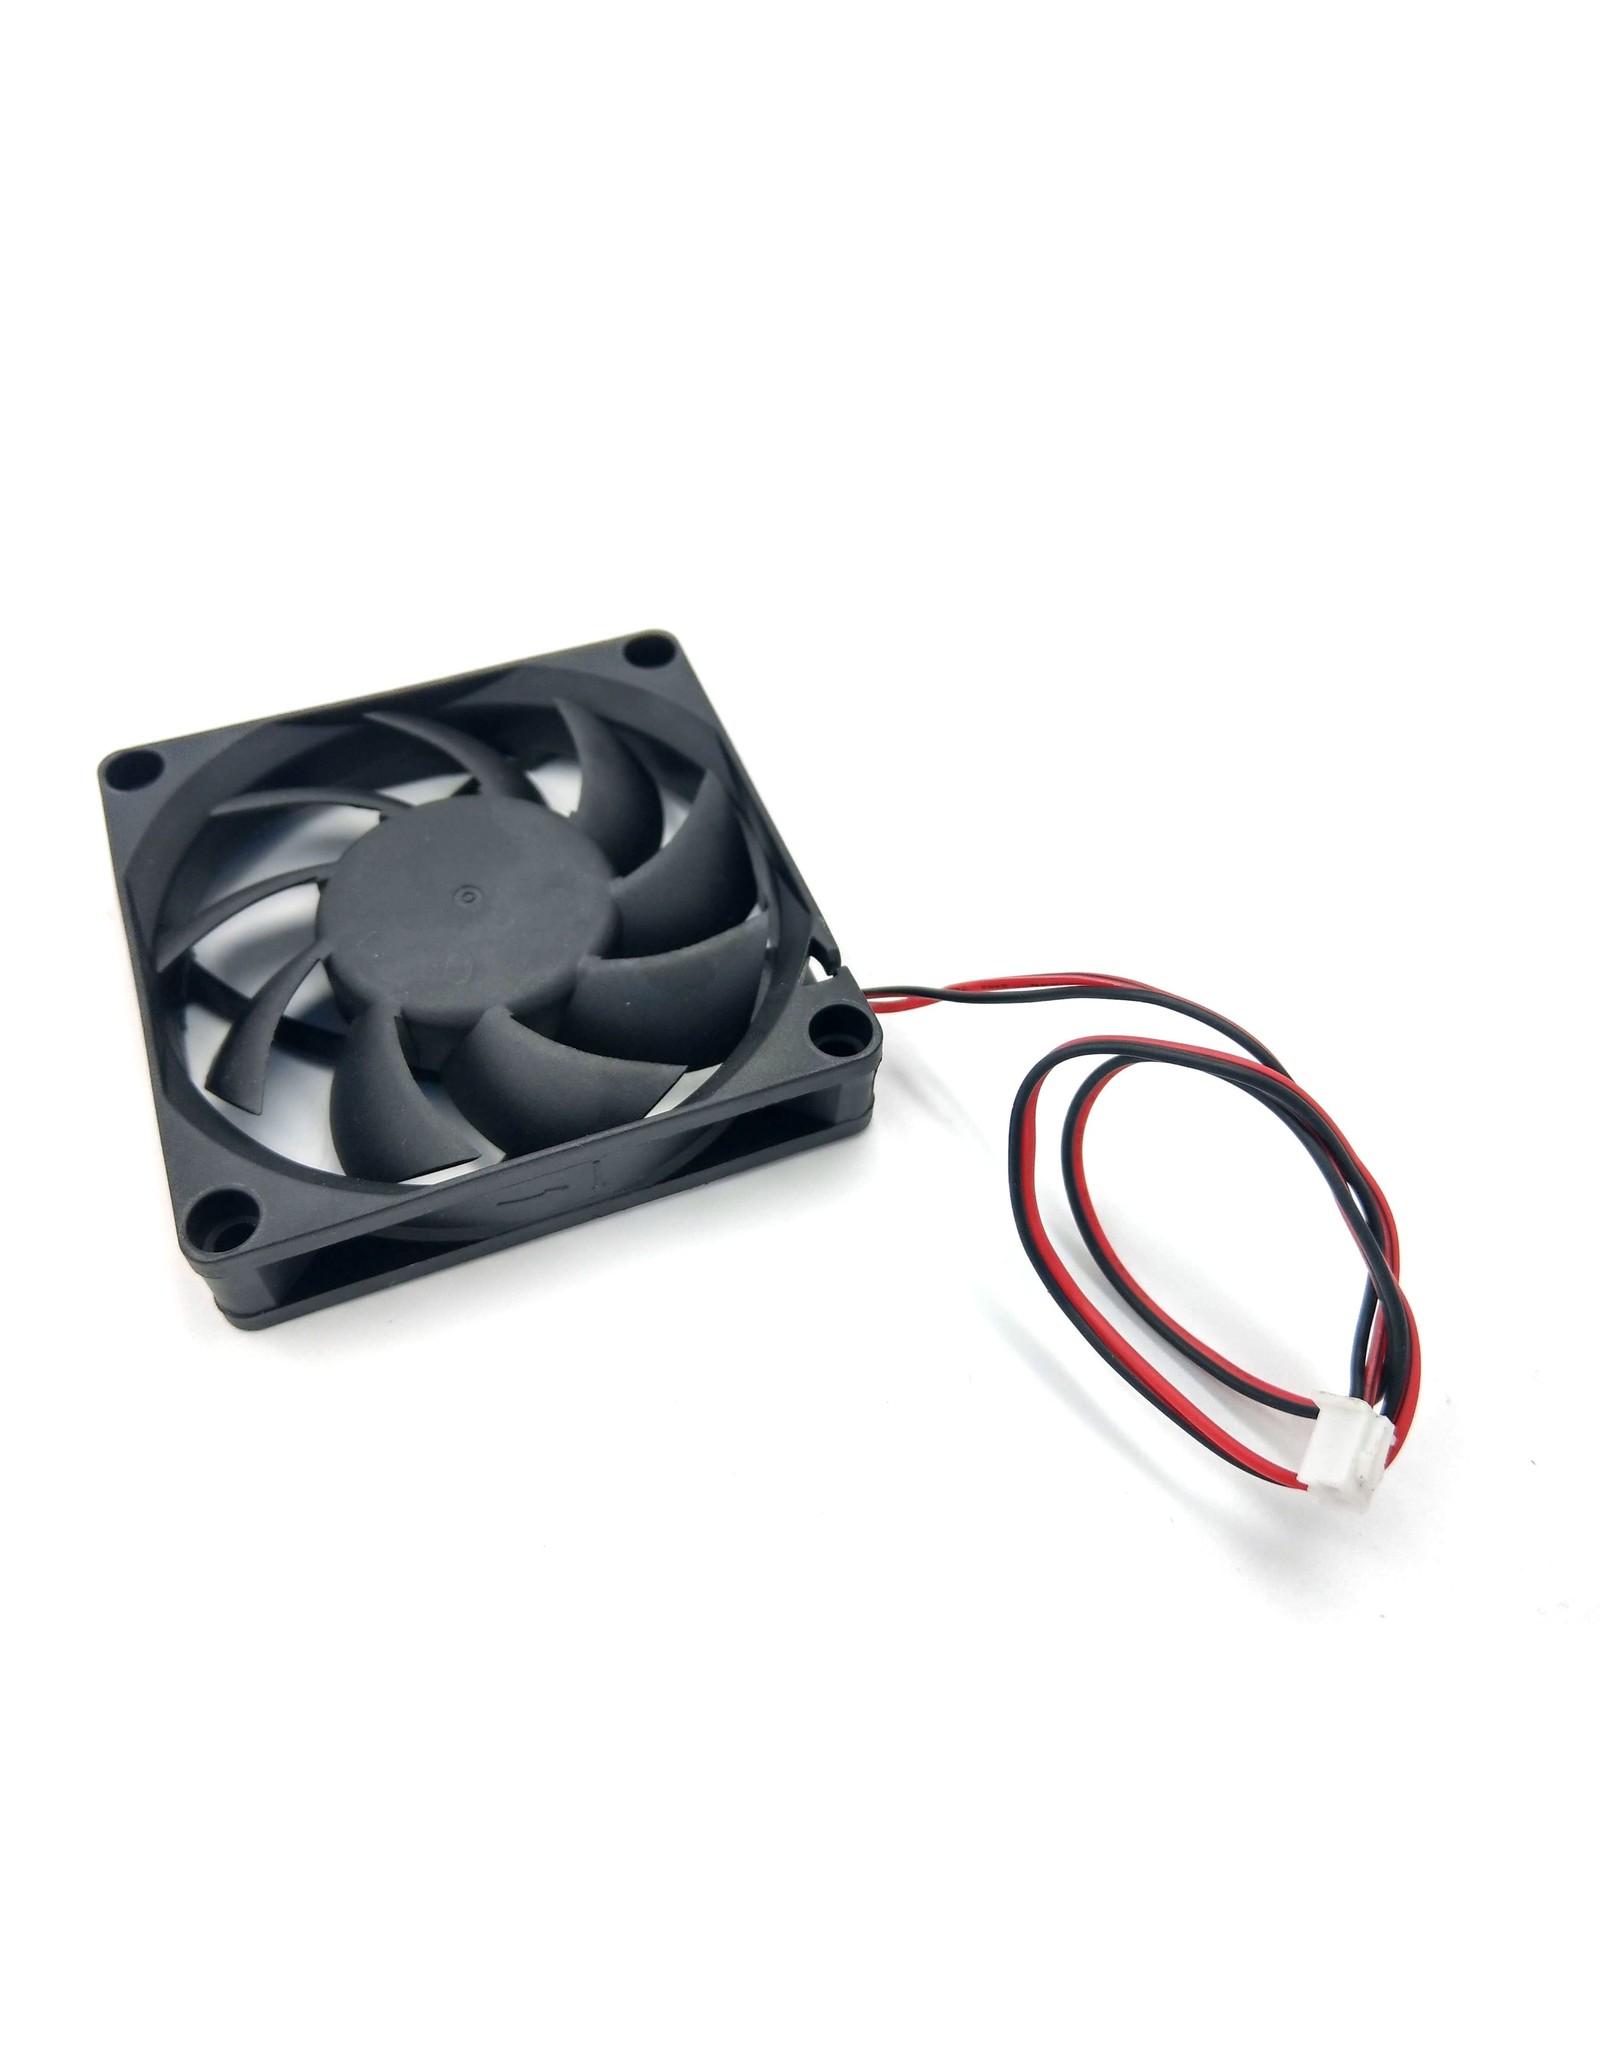 Zortrax Zortrax Bottom Fan for M200 / M200 Plus & M300 / M300 Plus